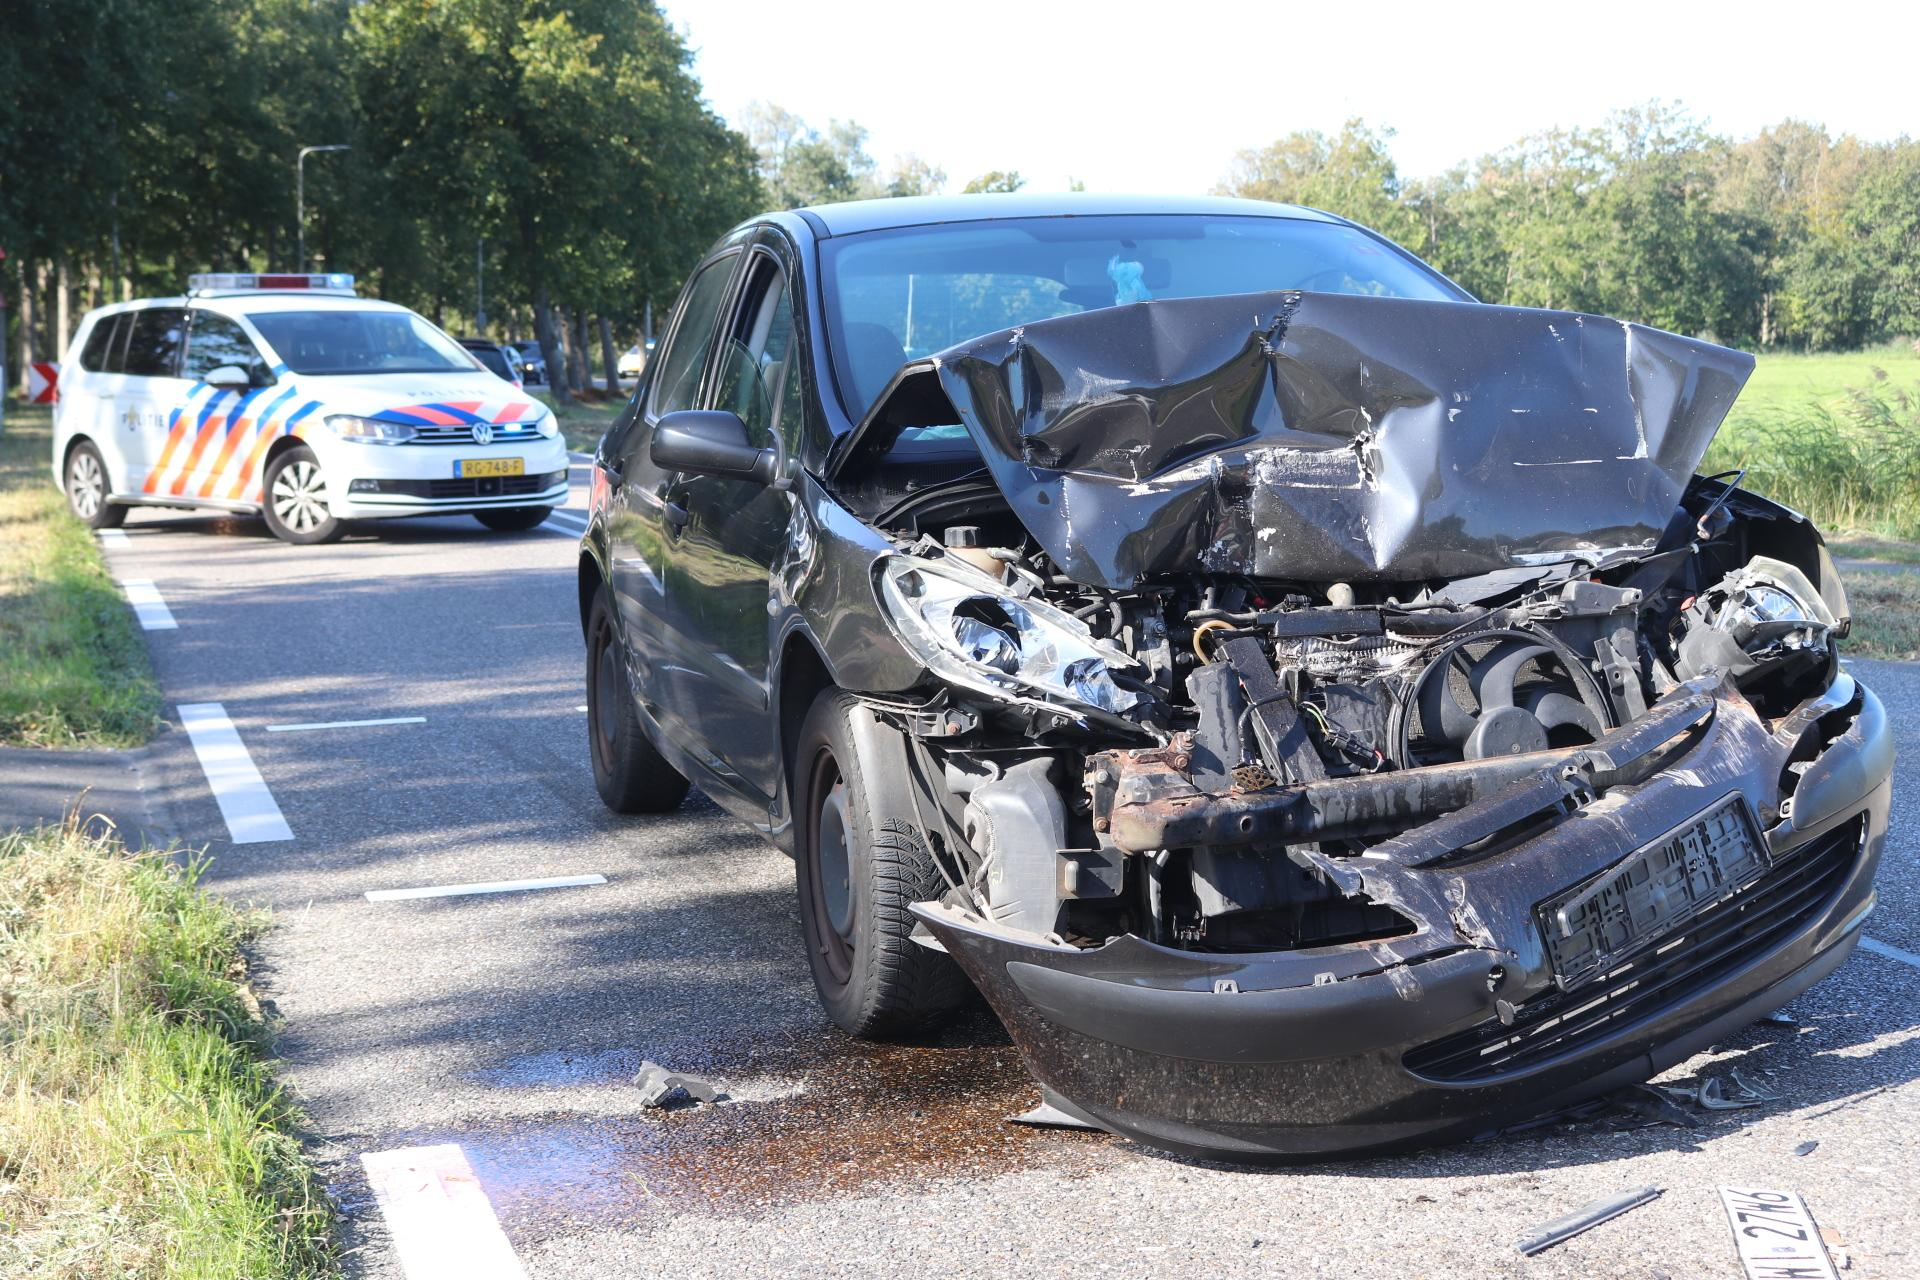 Flink ongeval op Stationsweg in Lisse, automobilist gewond